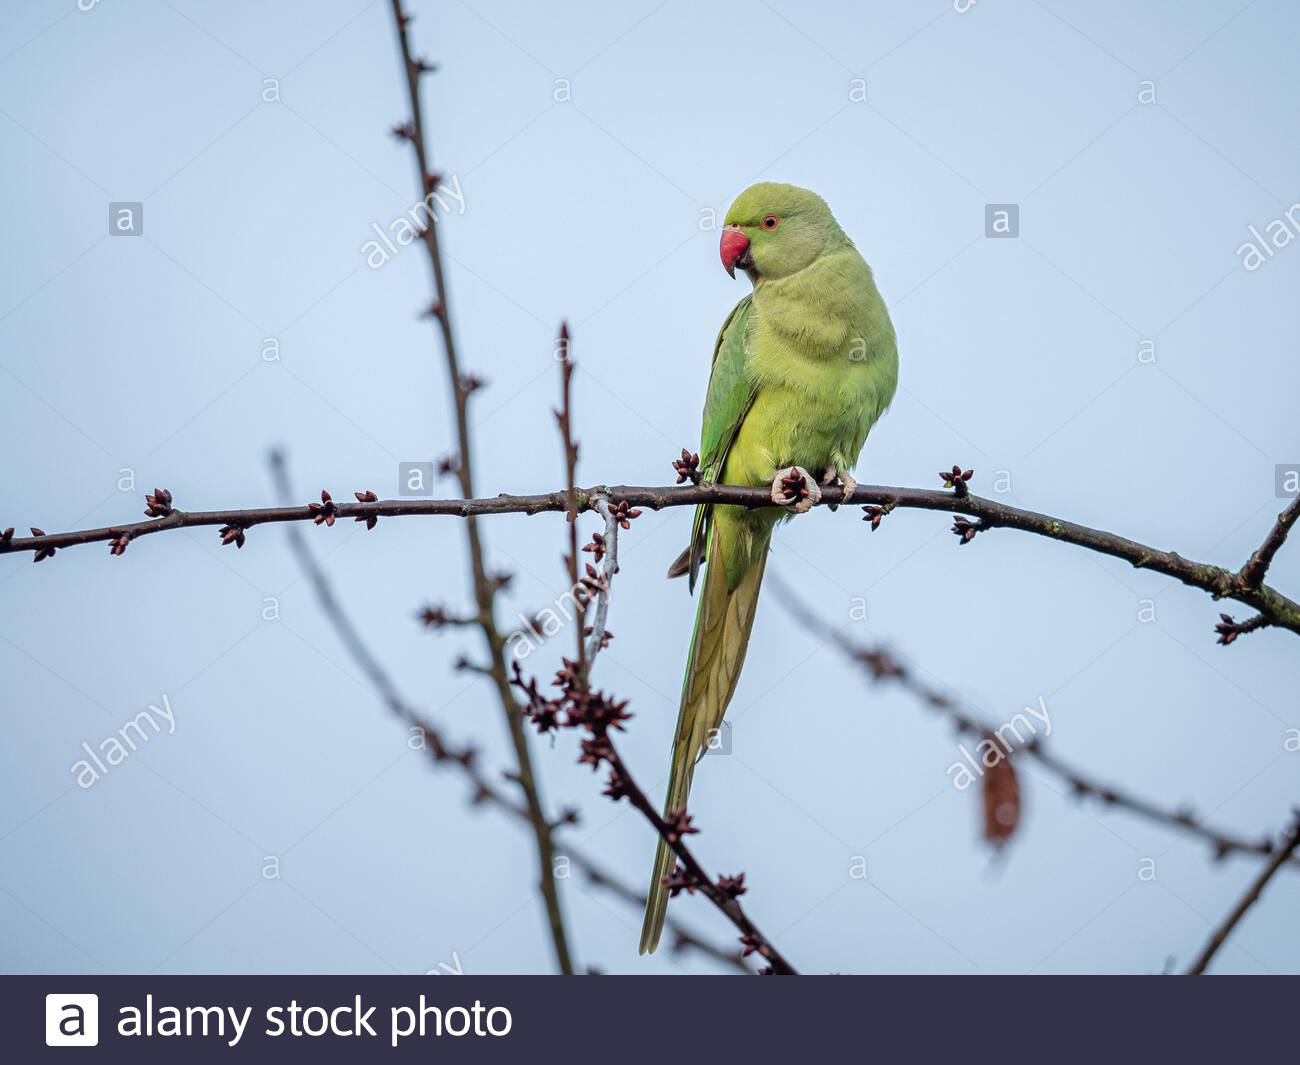 A feral parakeet (Psittacula krameri) seen in a tree at the Beddington Farmlands Nature Reserve, Sutton, London. Stock Photo